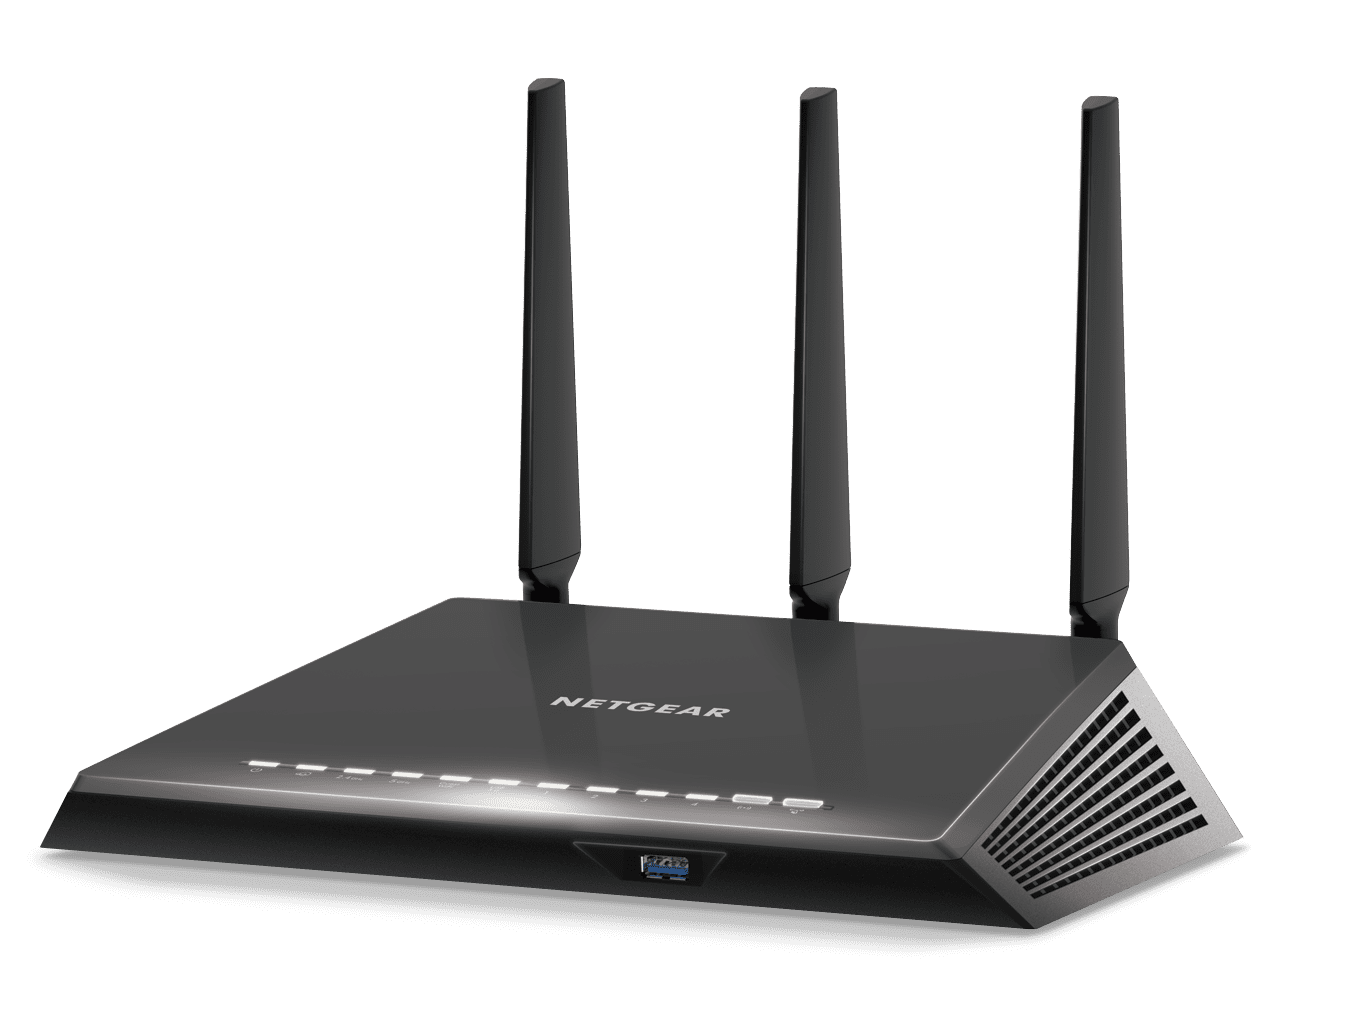 NETGEAR Nighthawk AC2100 Smart Wi-Fi Router (R7200-100NAS)